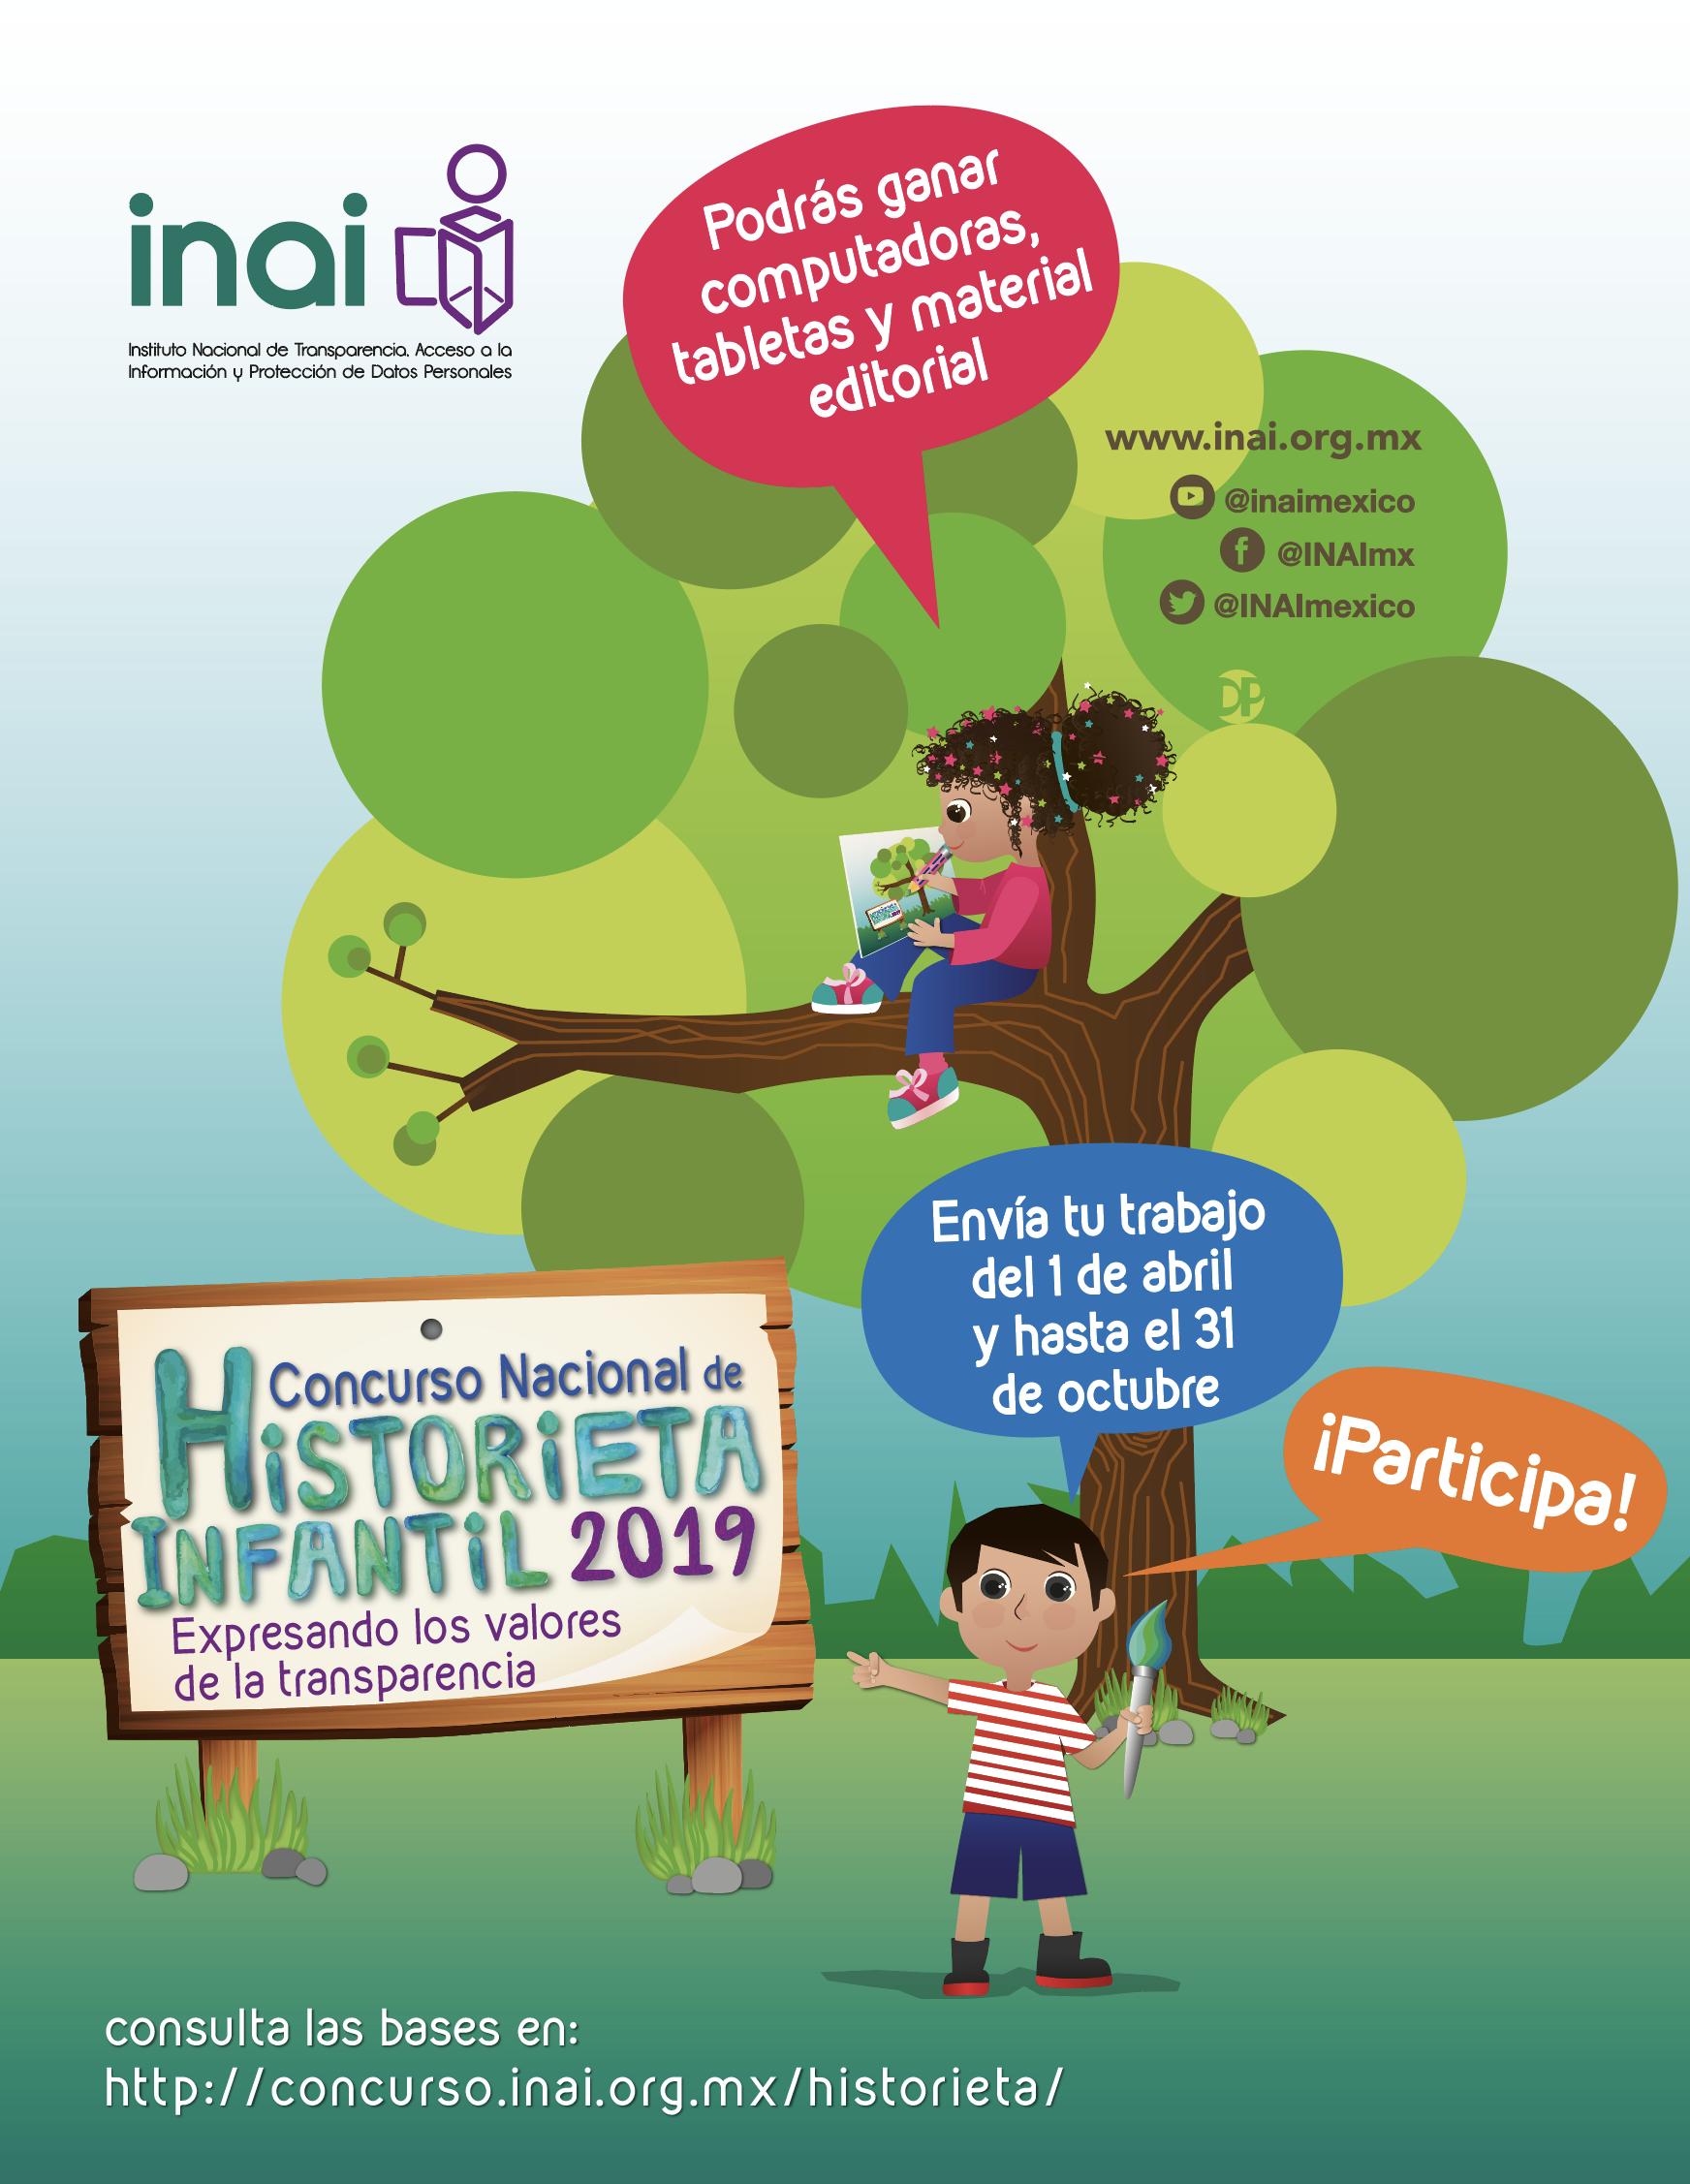 INAI :: Concurso Nacional de Historieta Infantil 2019